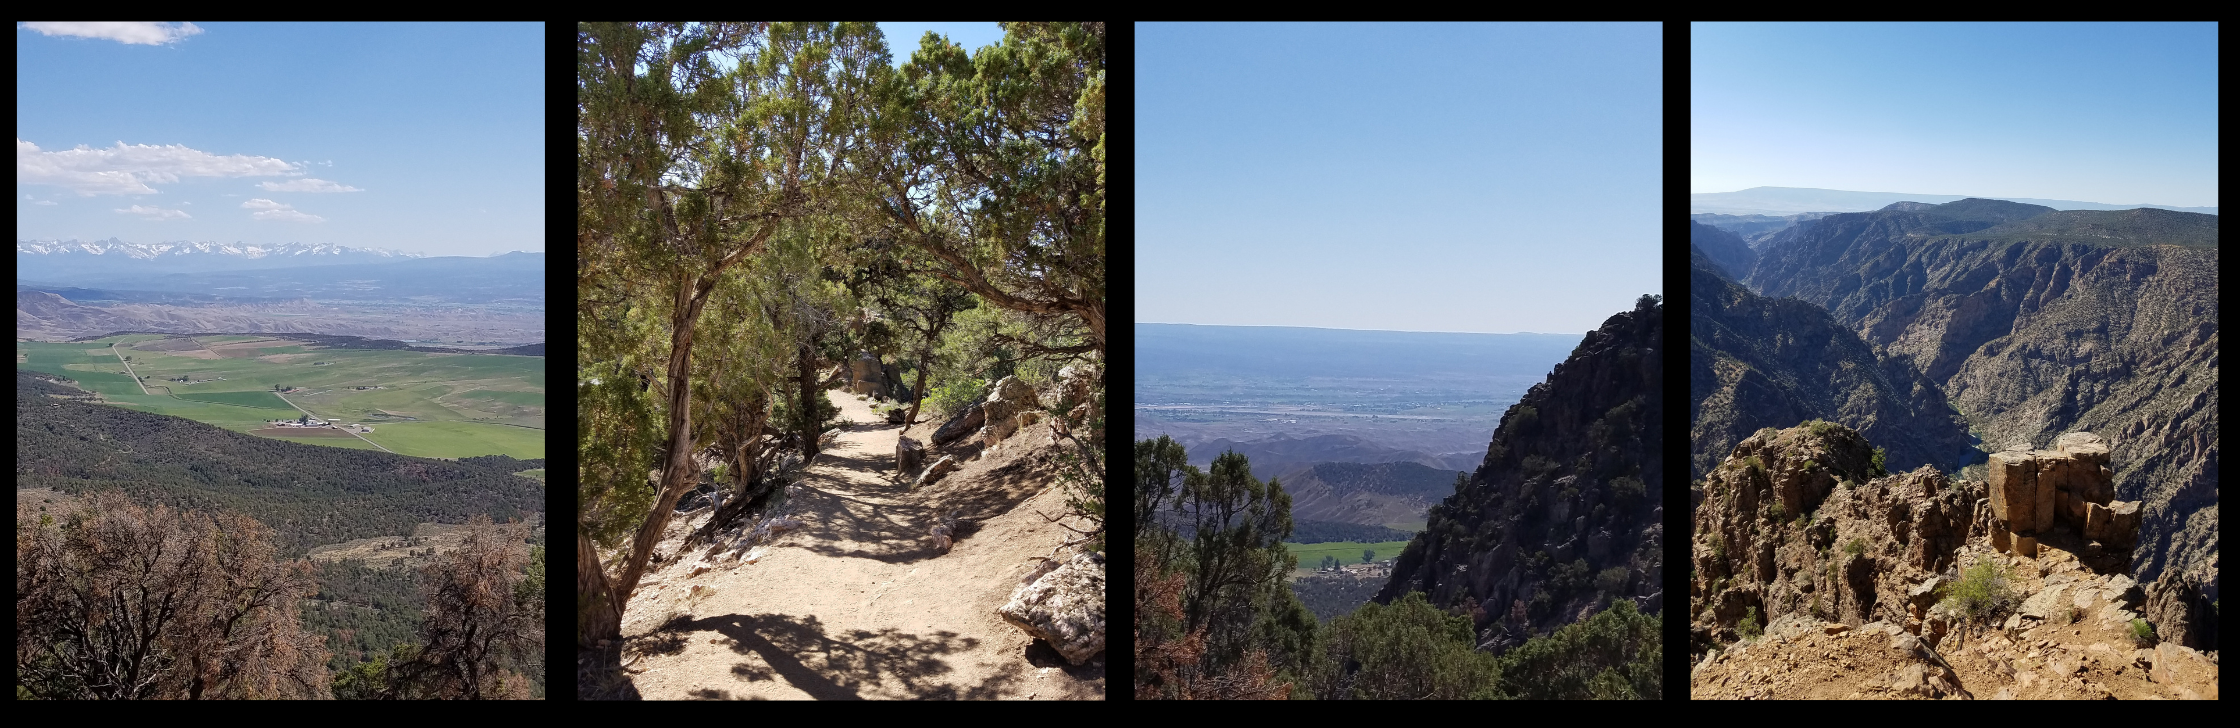 high-point-hike